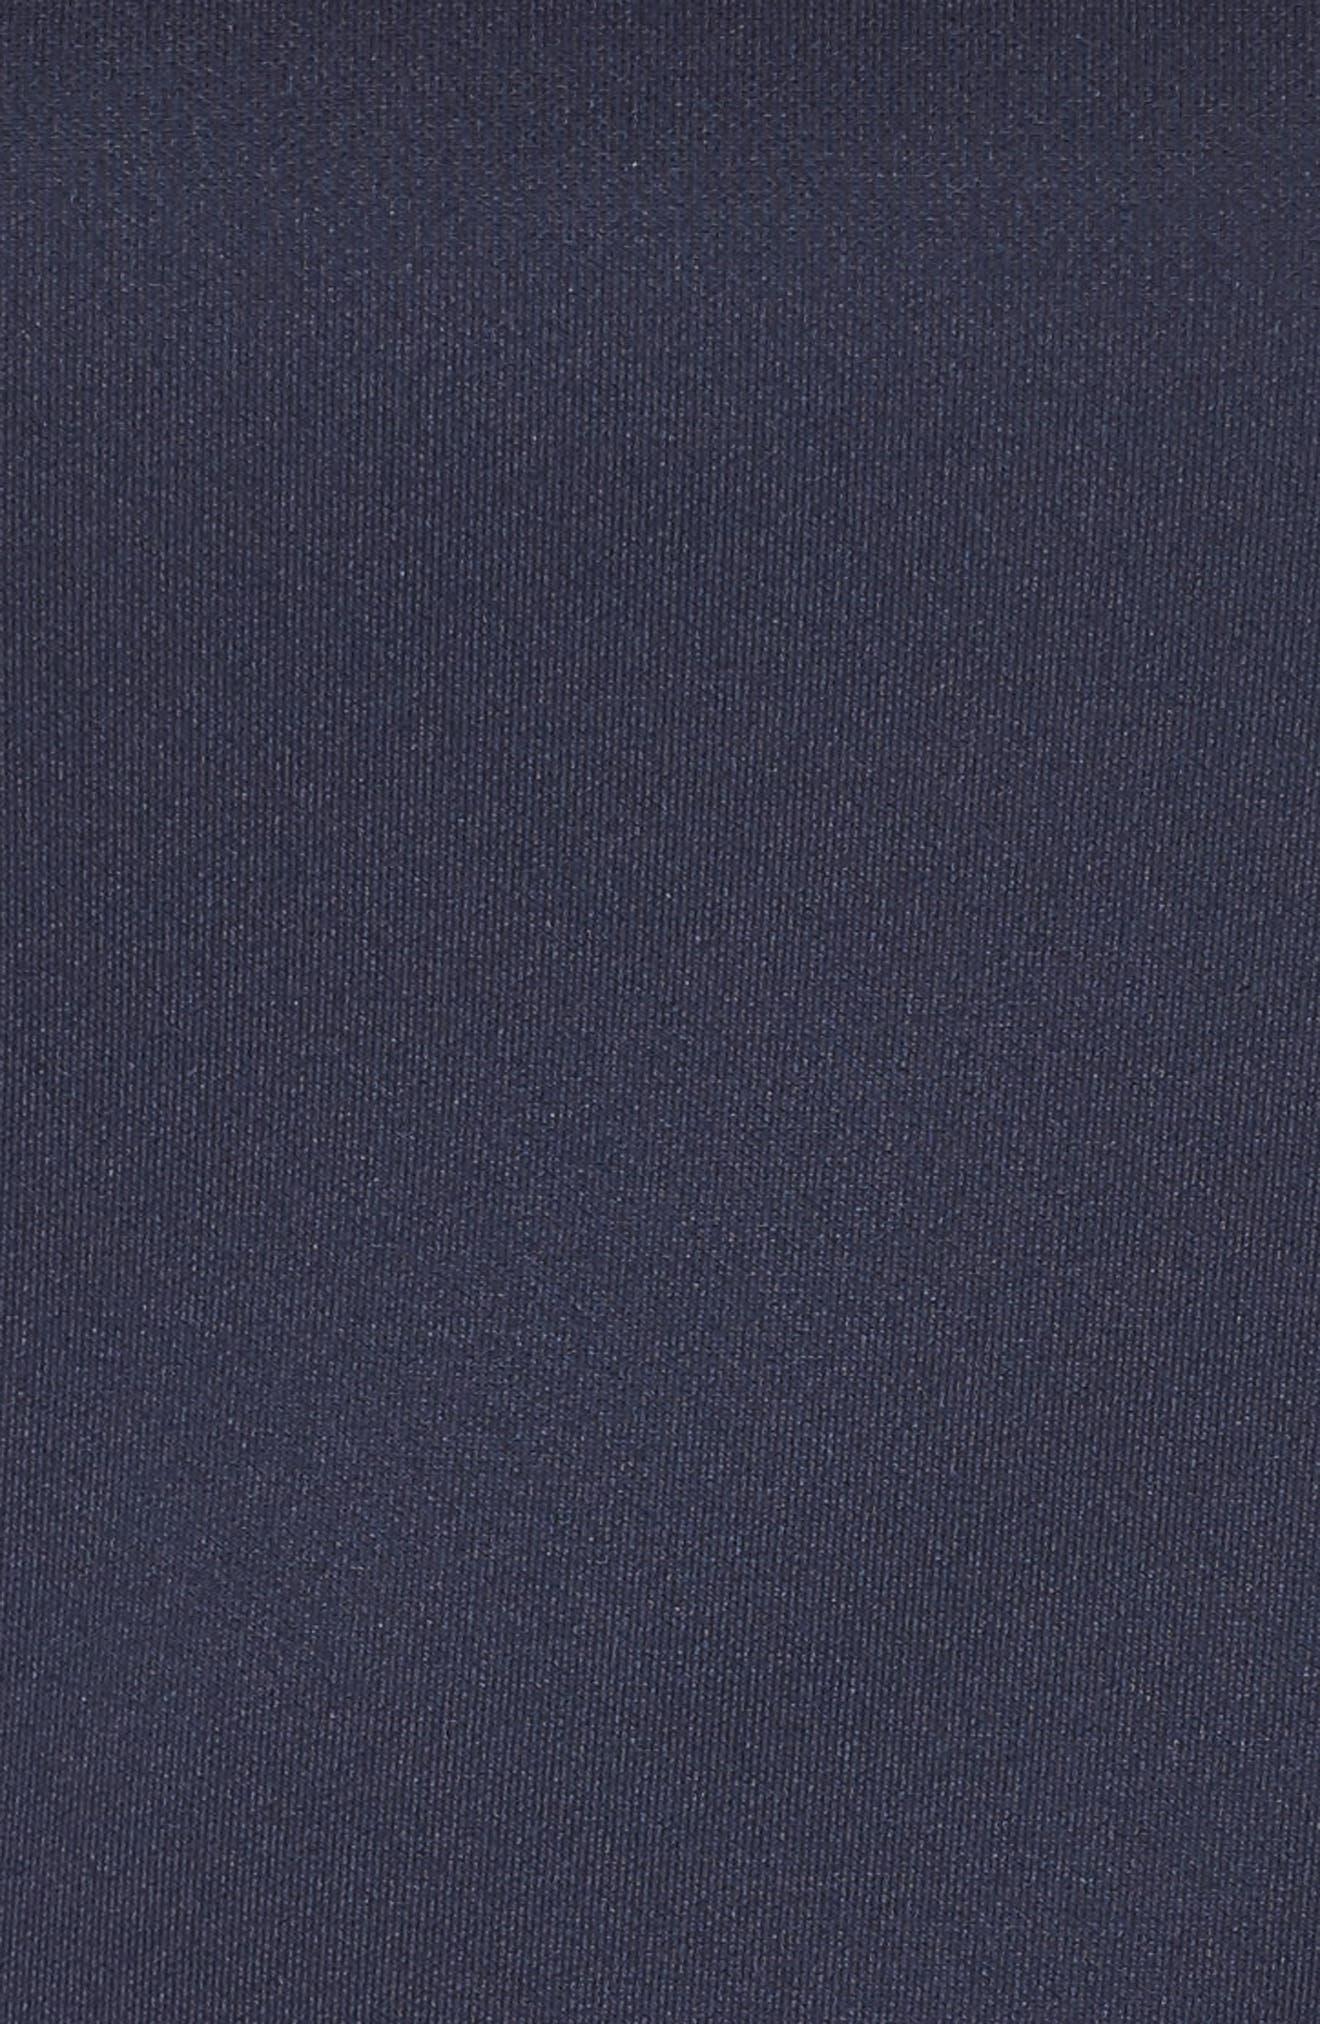 Mila Sheath Dress,                             Alternate thumbnail 5, color,                             True Navy